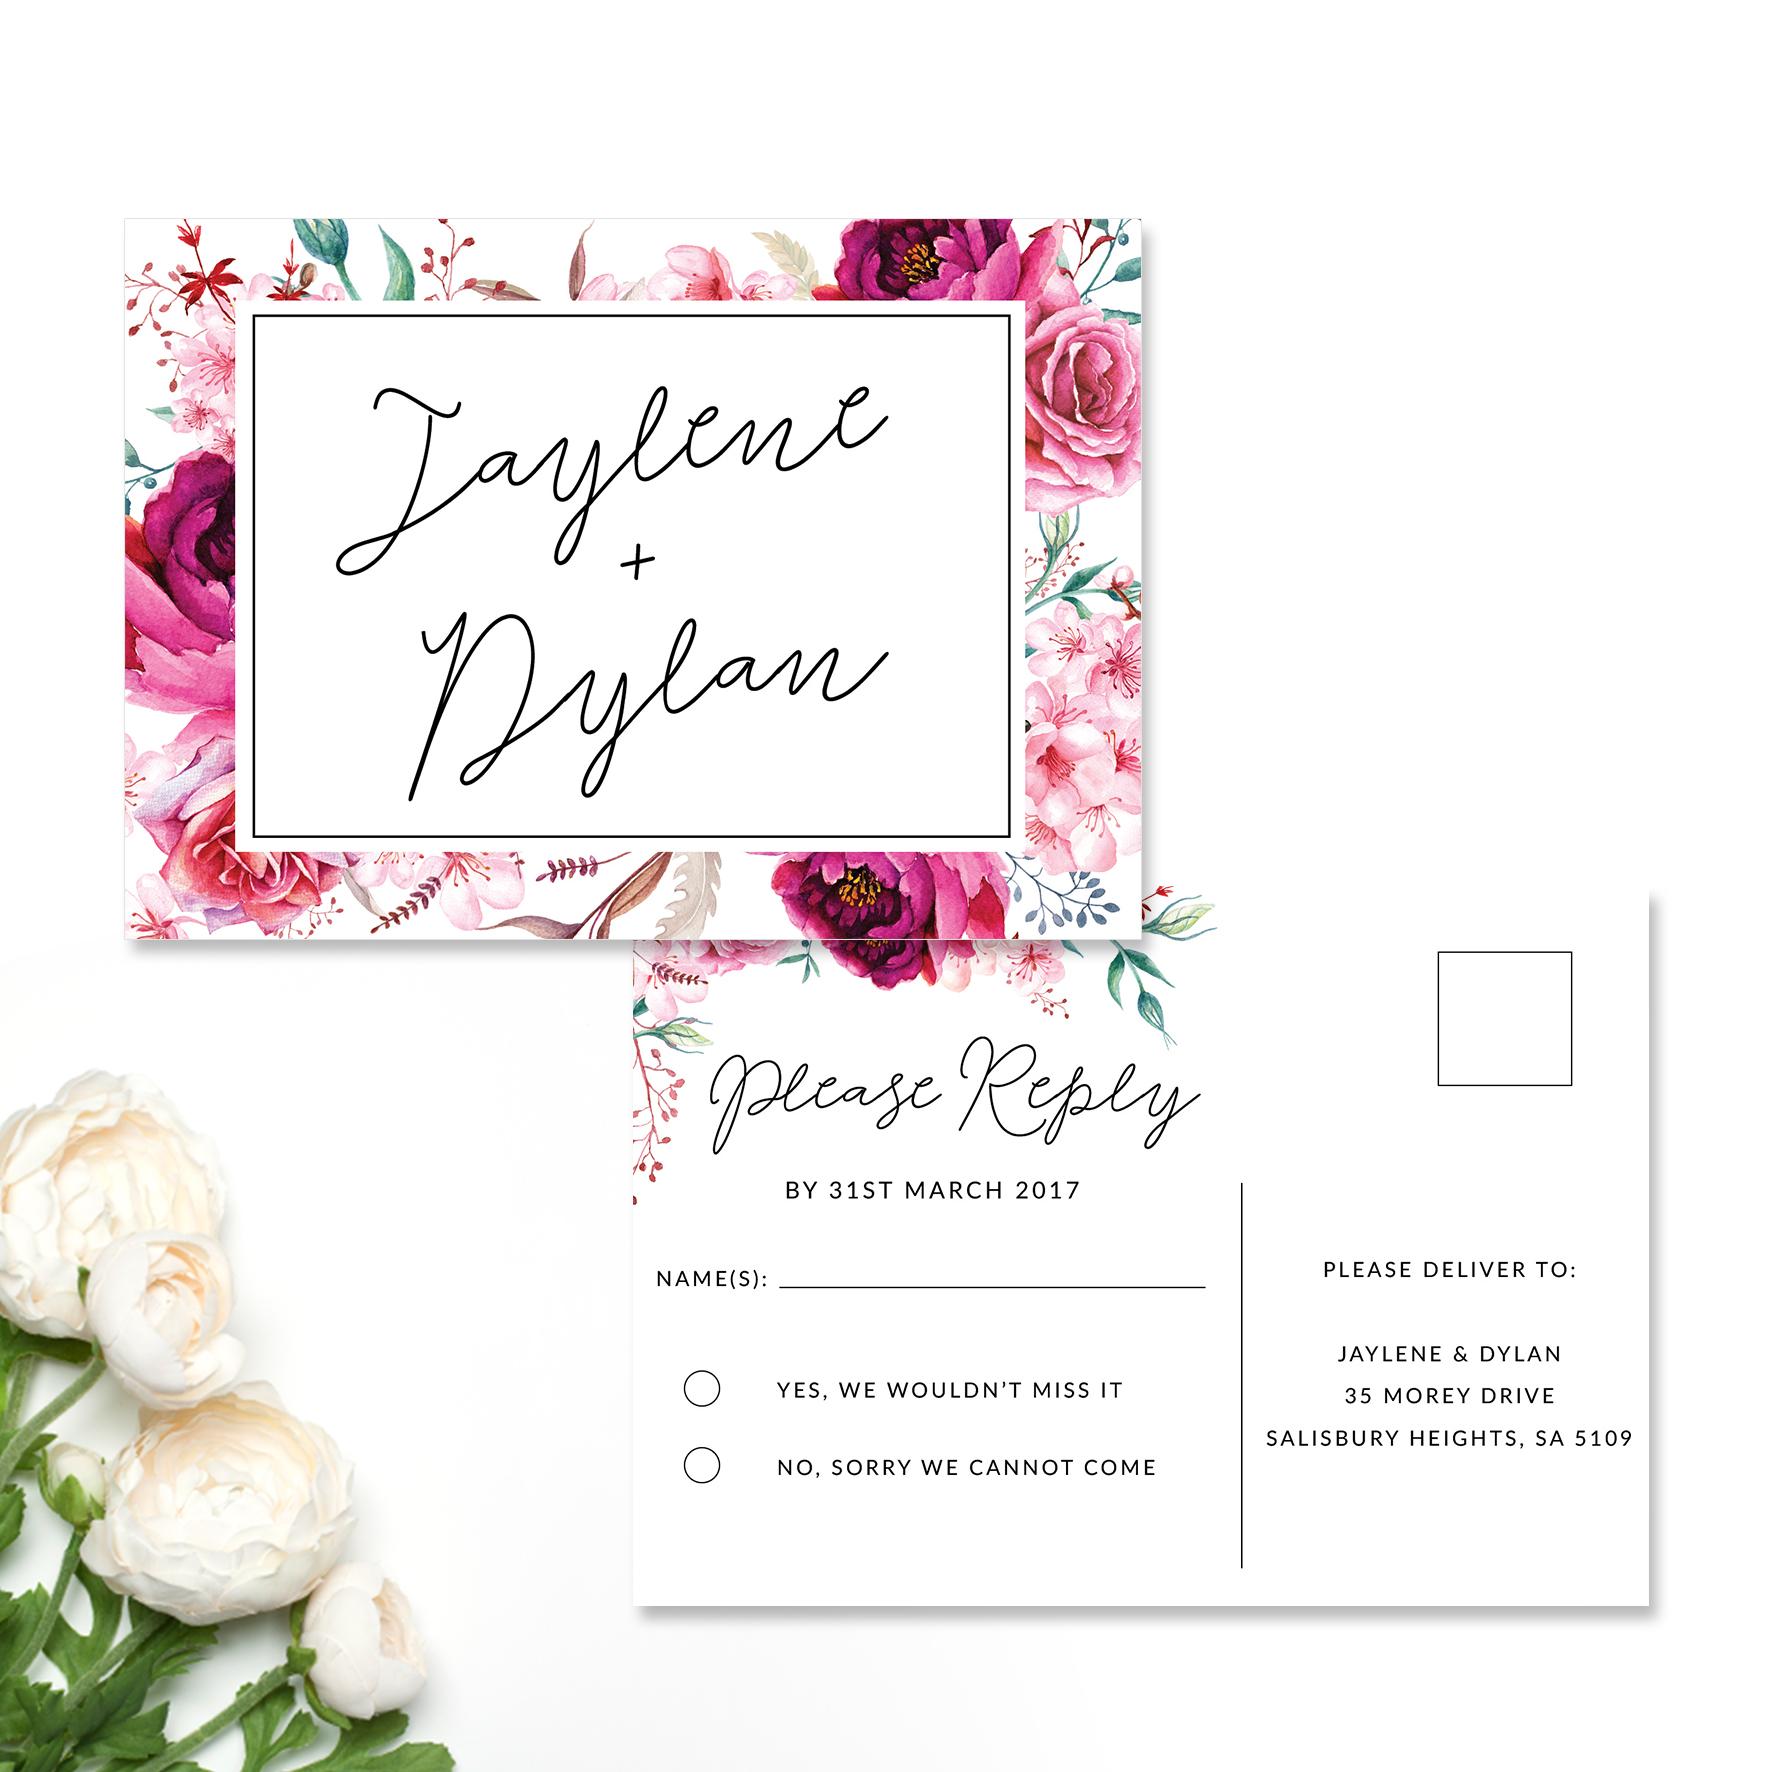 Jaylene + Dylan Reply Card